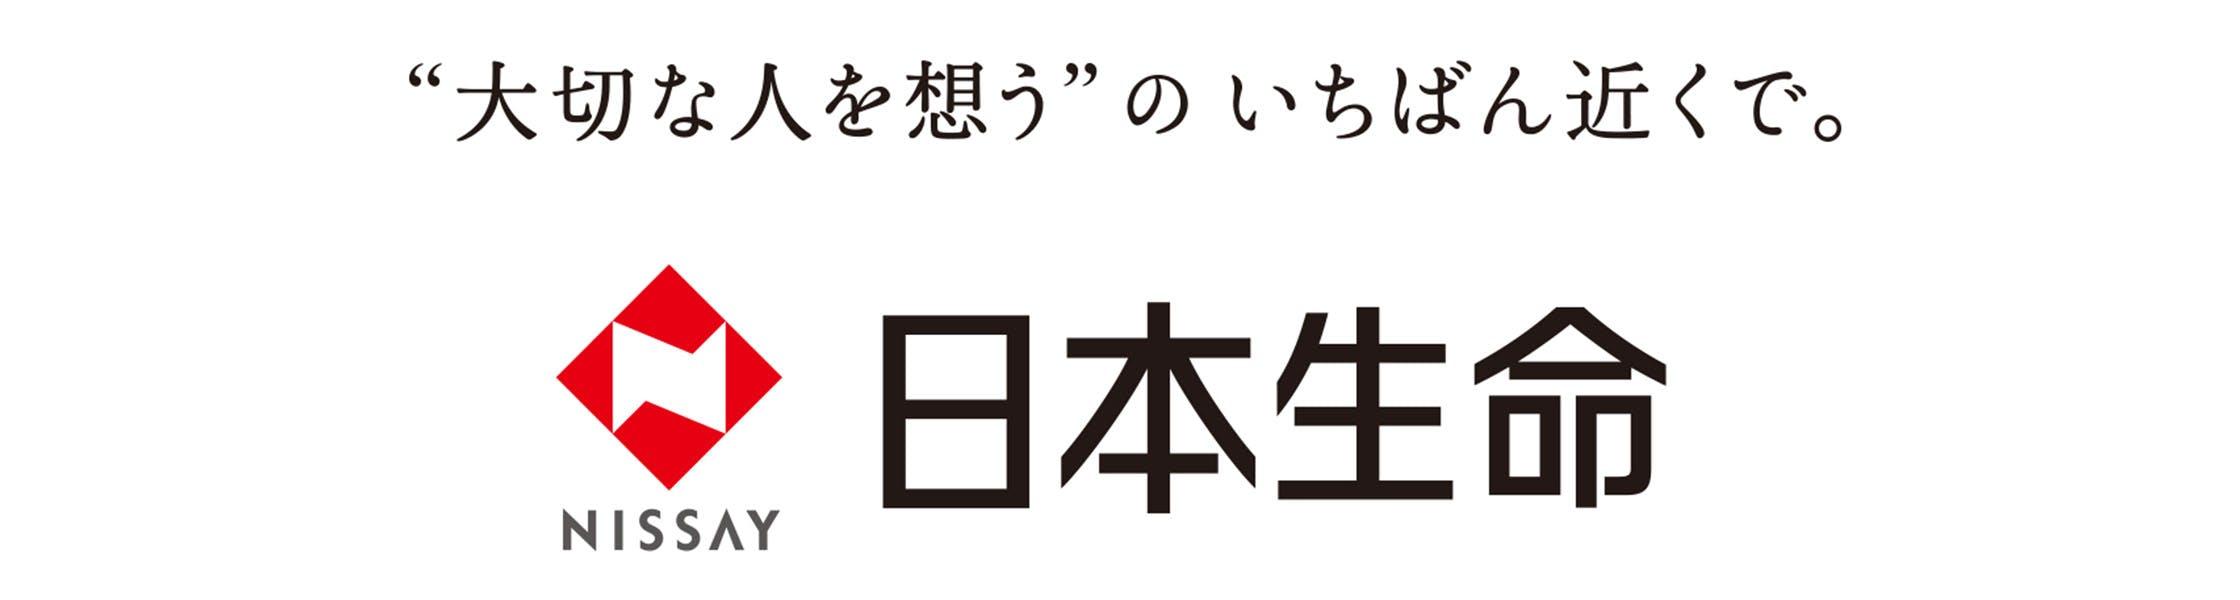 1581490250 nihonseimei top.jpg?ixlib=rails 3.0